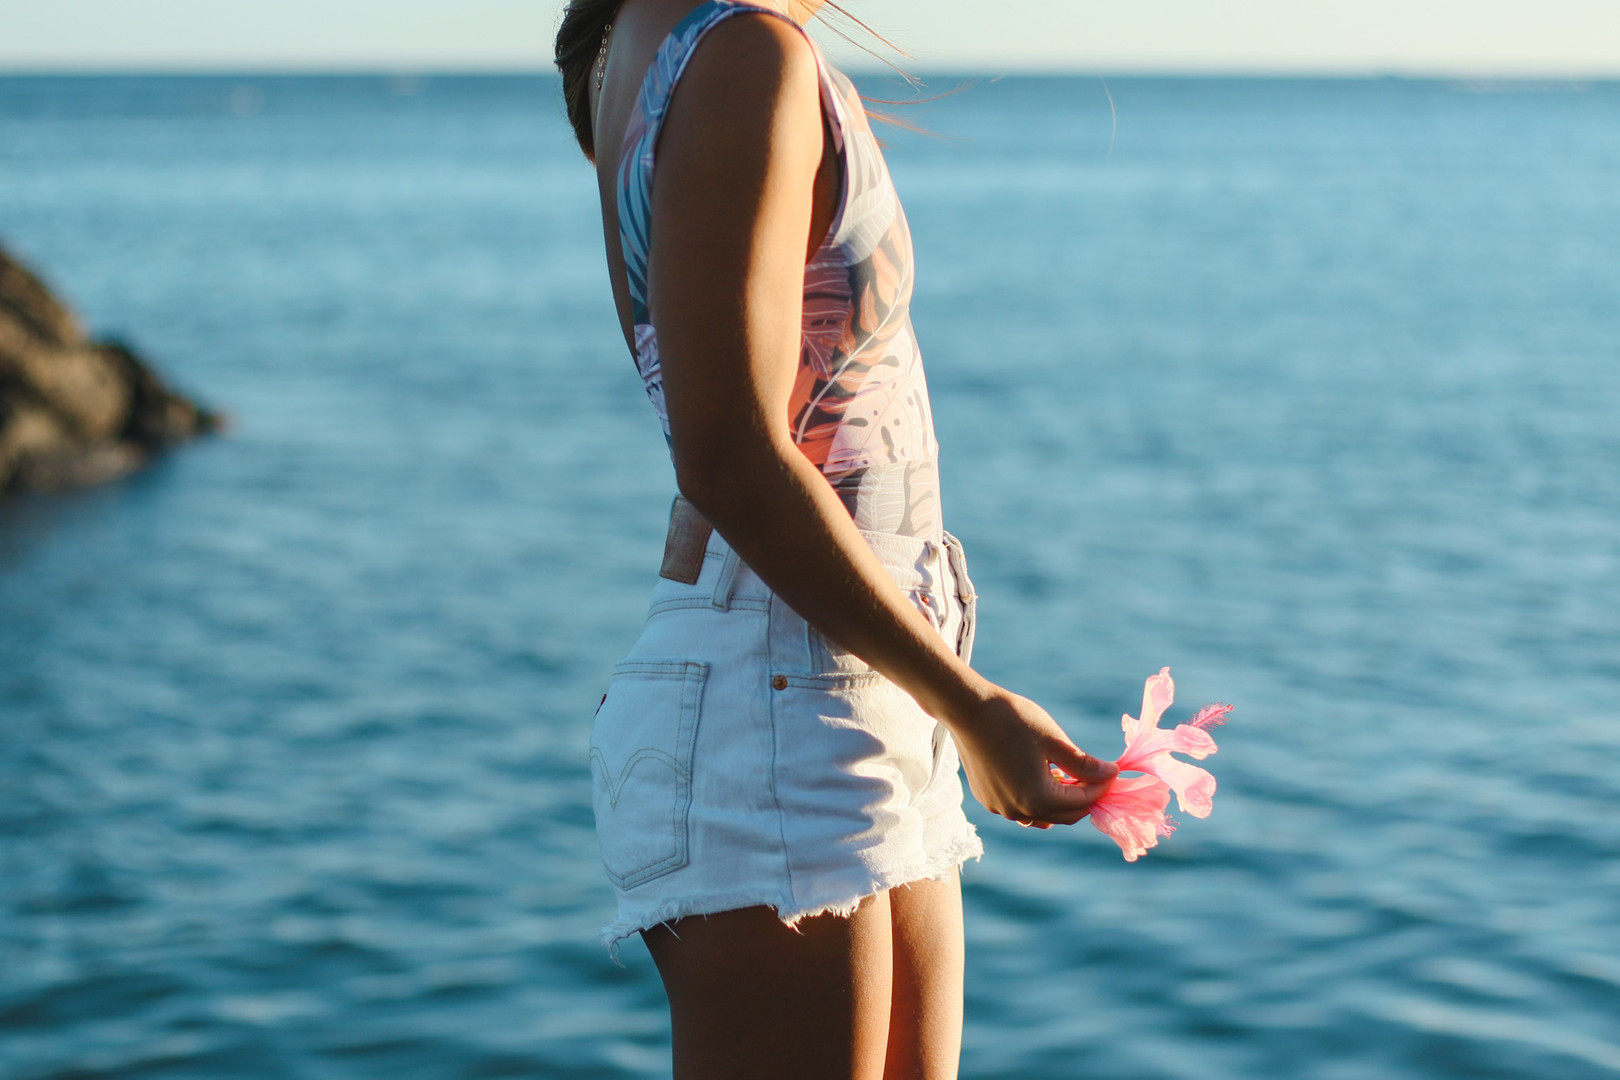 Island Lifestyle - ERIOCEAN-40.jpg